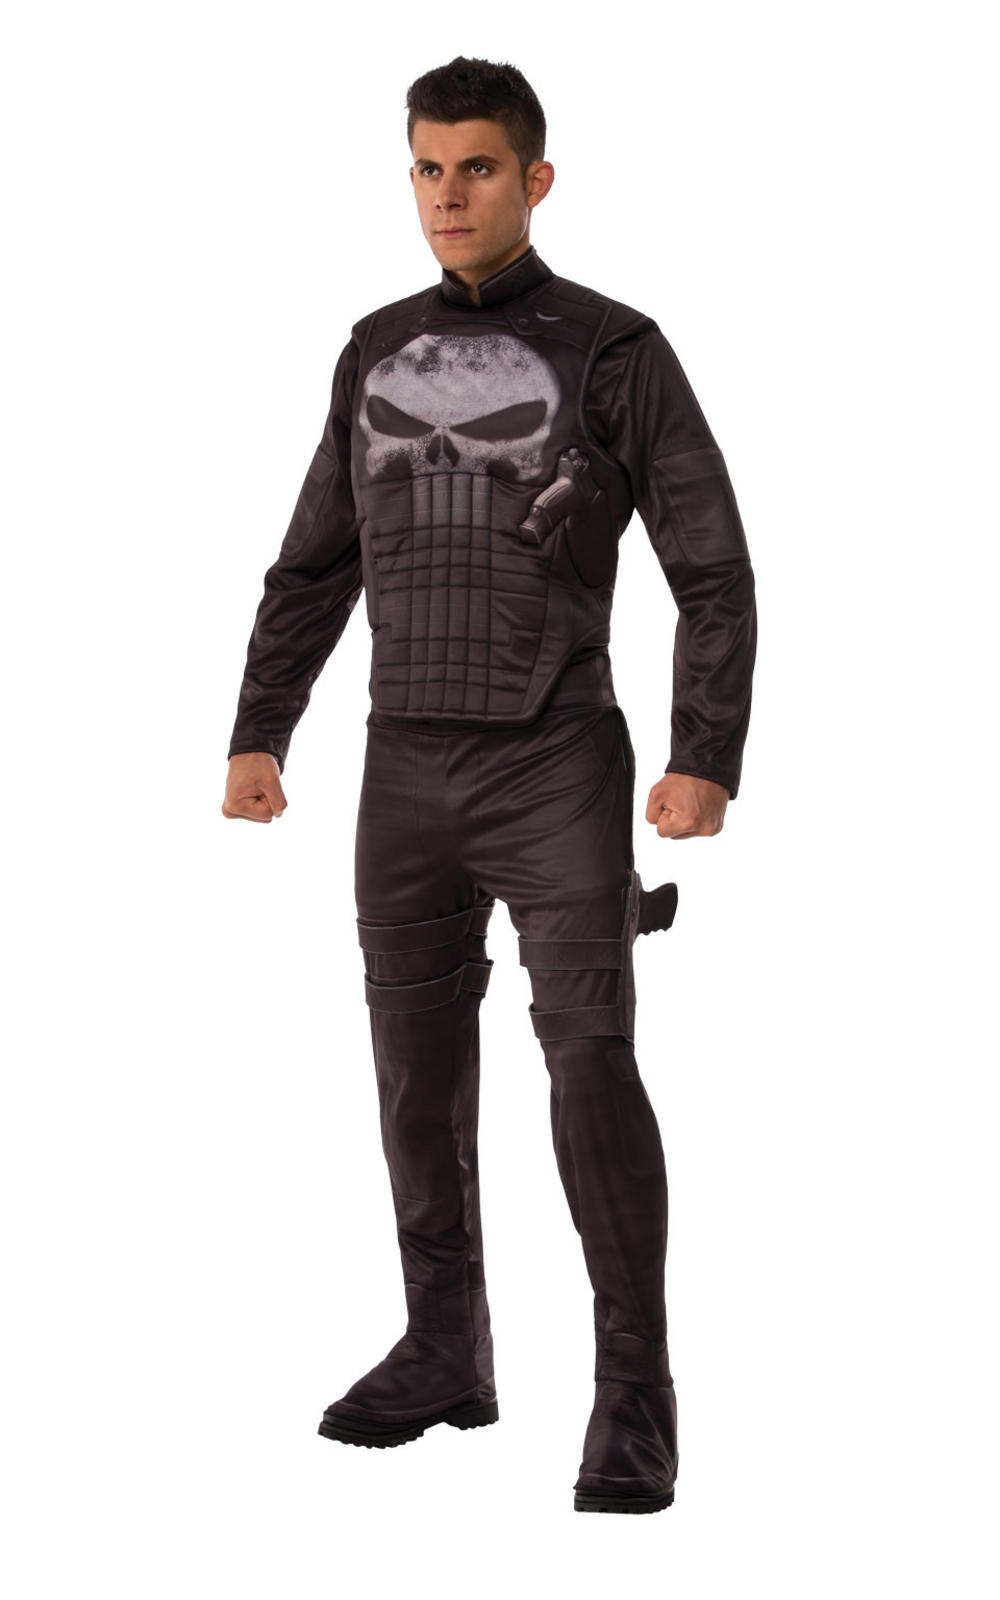 Deluxe Punisher Mens Costume